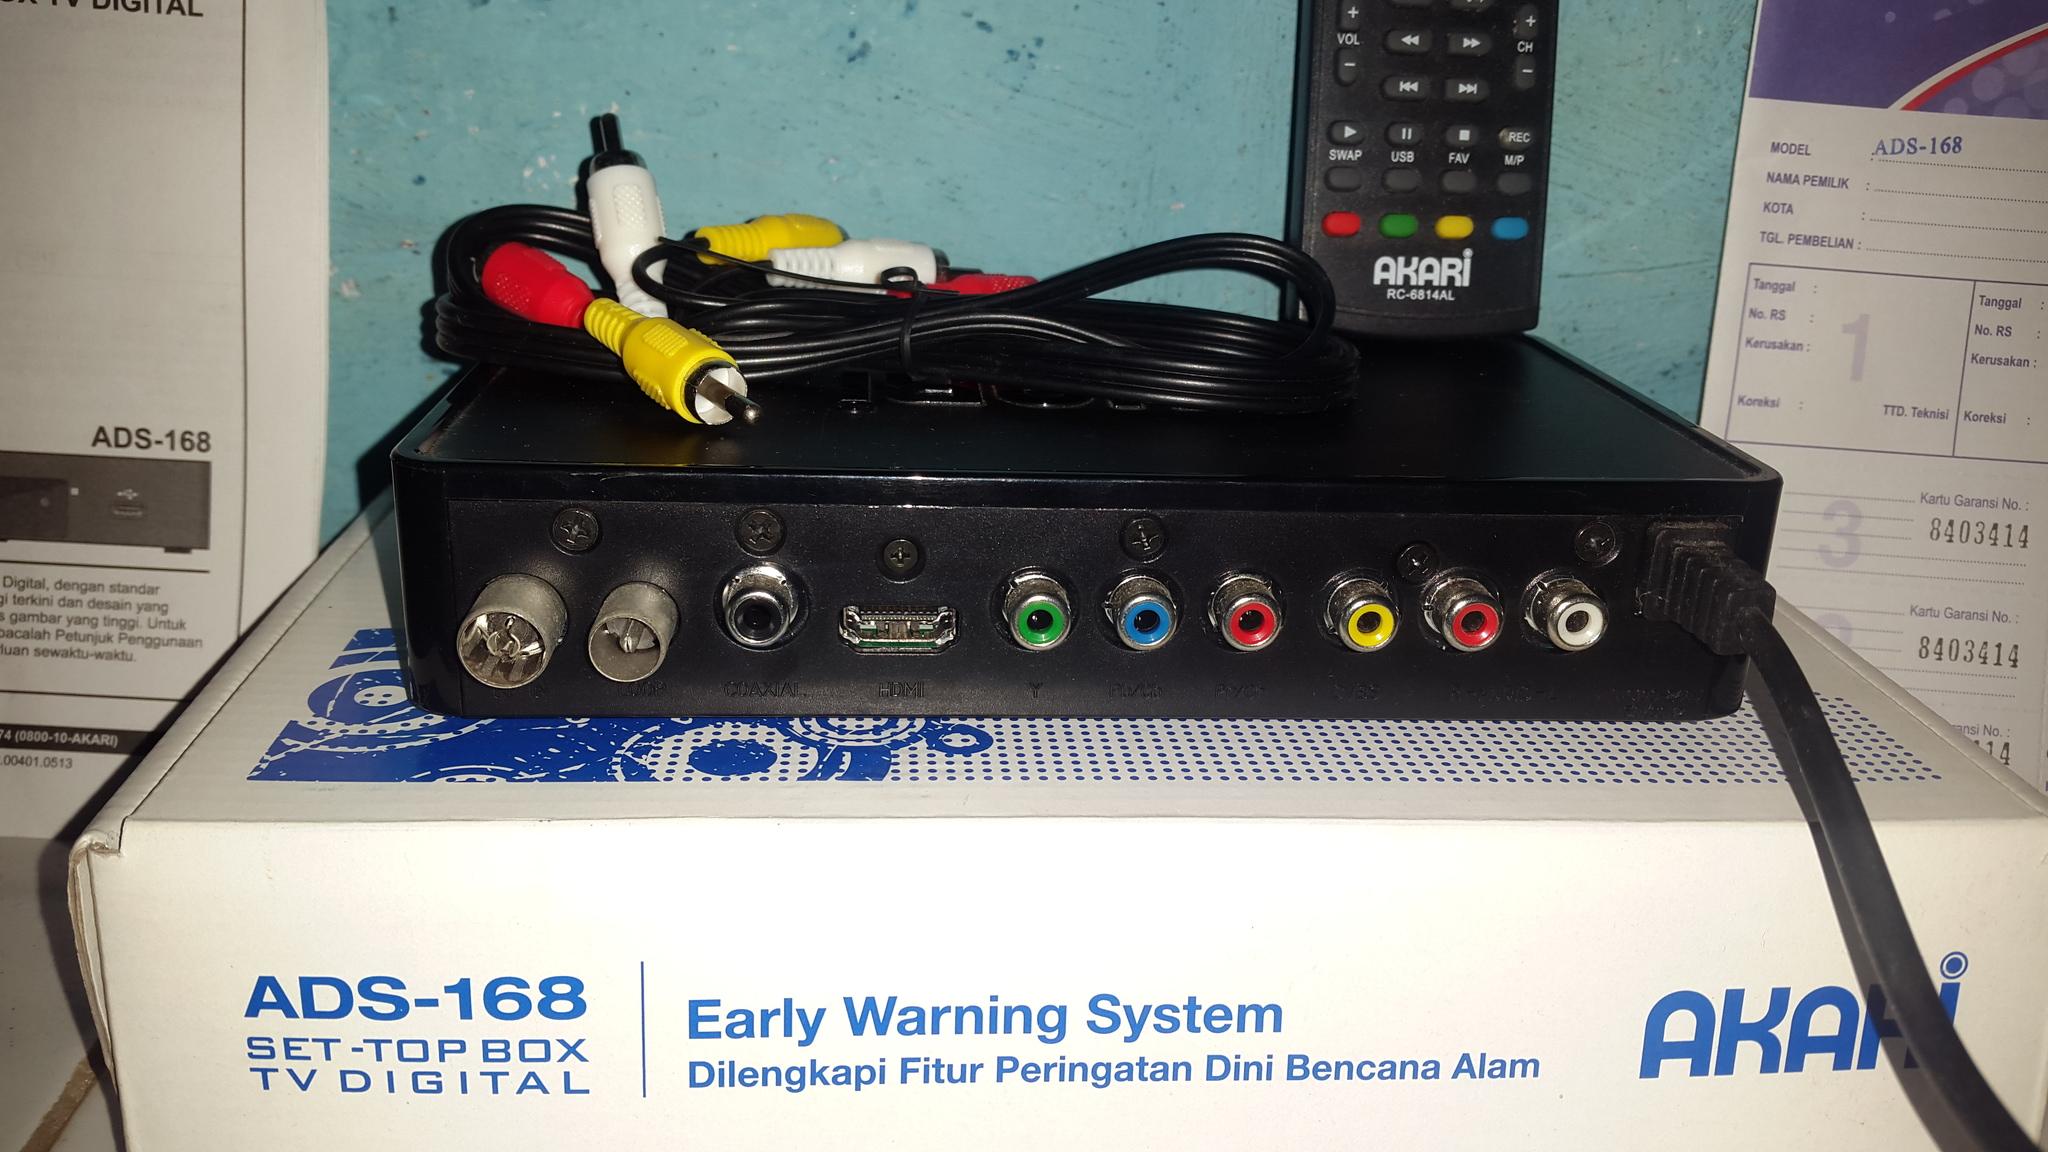 Jual Terlaris Akari Set Top Box DVB T2 dengan EWS ADS 168 Hitam Source · 6209904 f6a2ca4d e217 4626 a269 32f3cac5b00e jpg